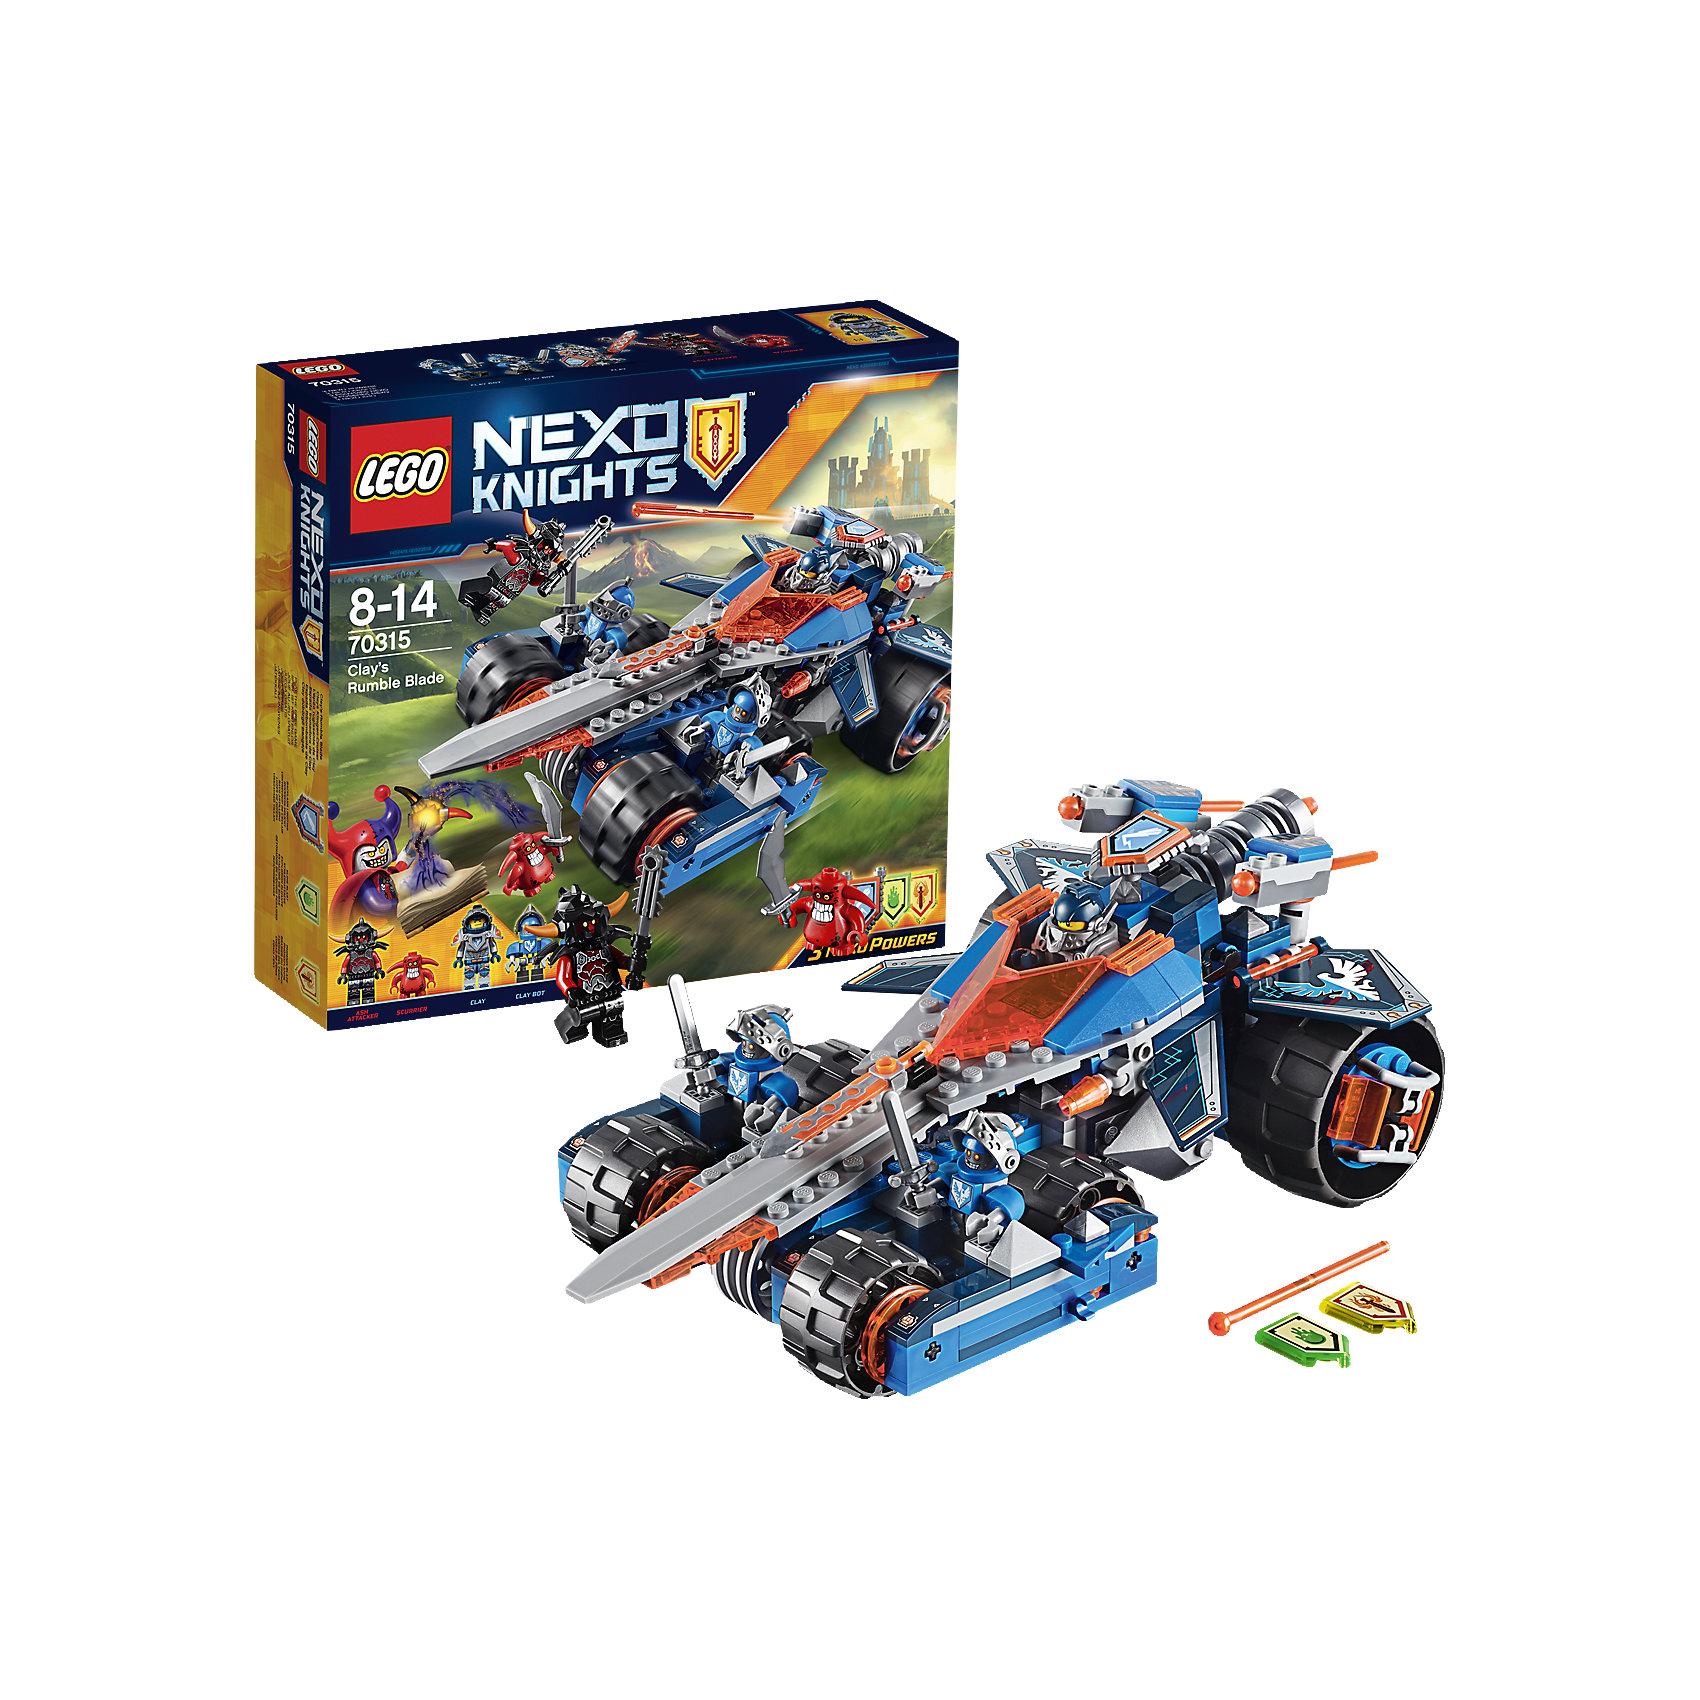 LEGO NEXO KNIGHTS 70315: Устрашающий разрушитель Клэя